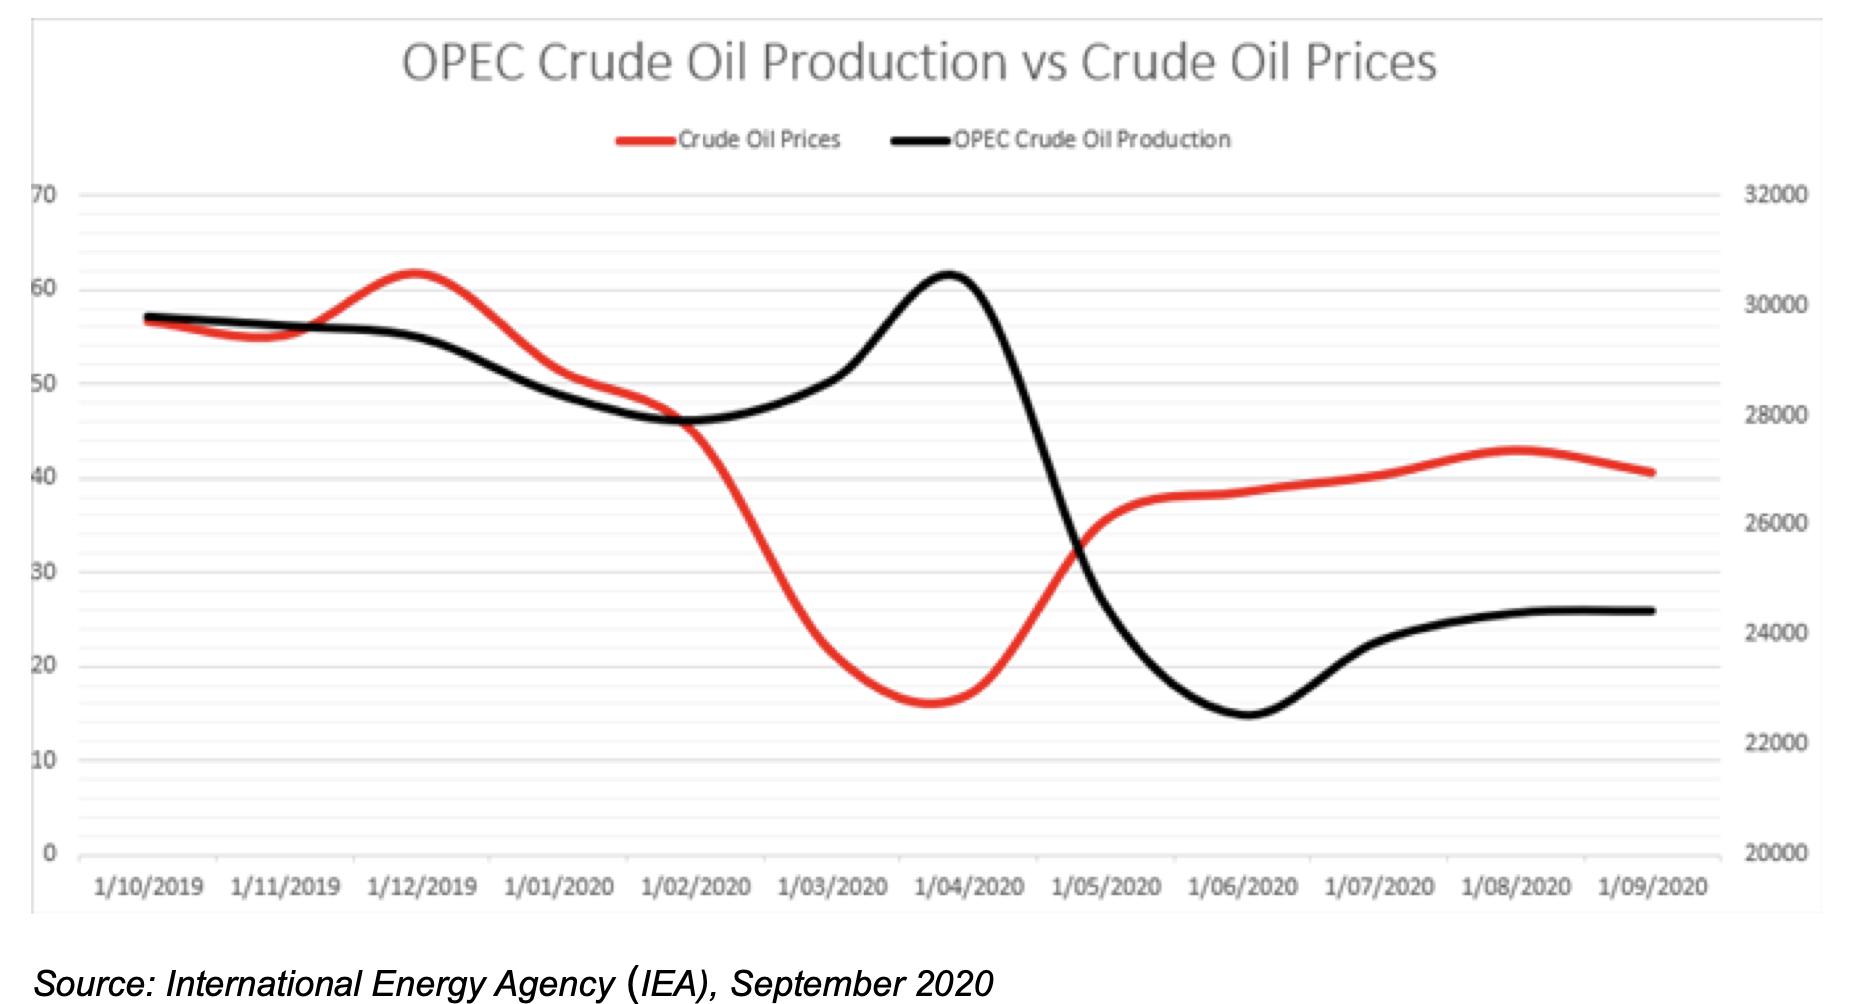 OPEC Crude Oil Production vc Crude Oil prices